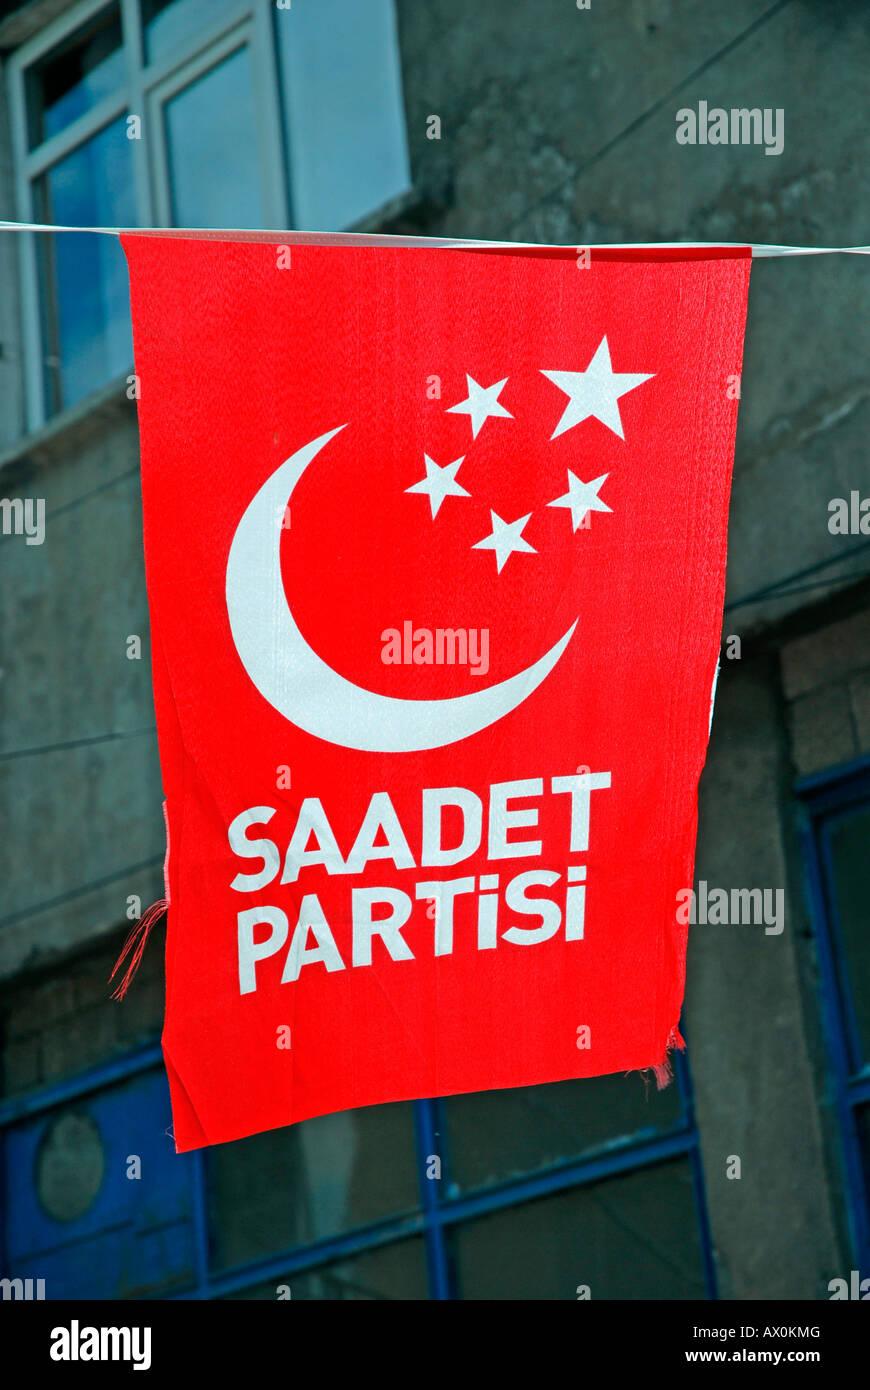 Elections: Islamic-associated Saadet Partisi party flags, Erzurum, eastern Anatolia, Turkey, Asia Stock Photo